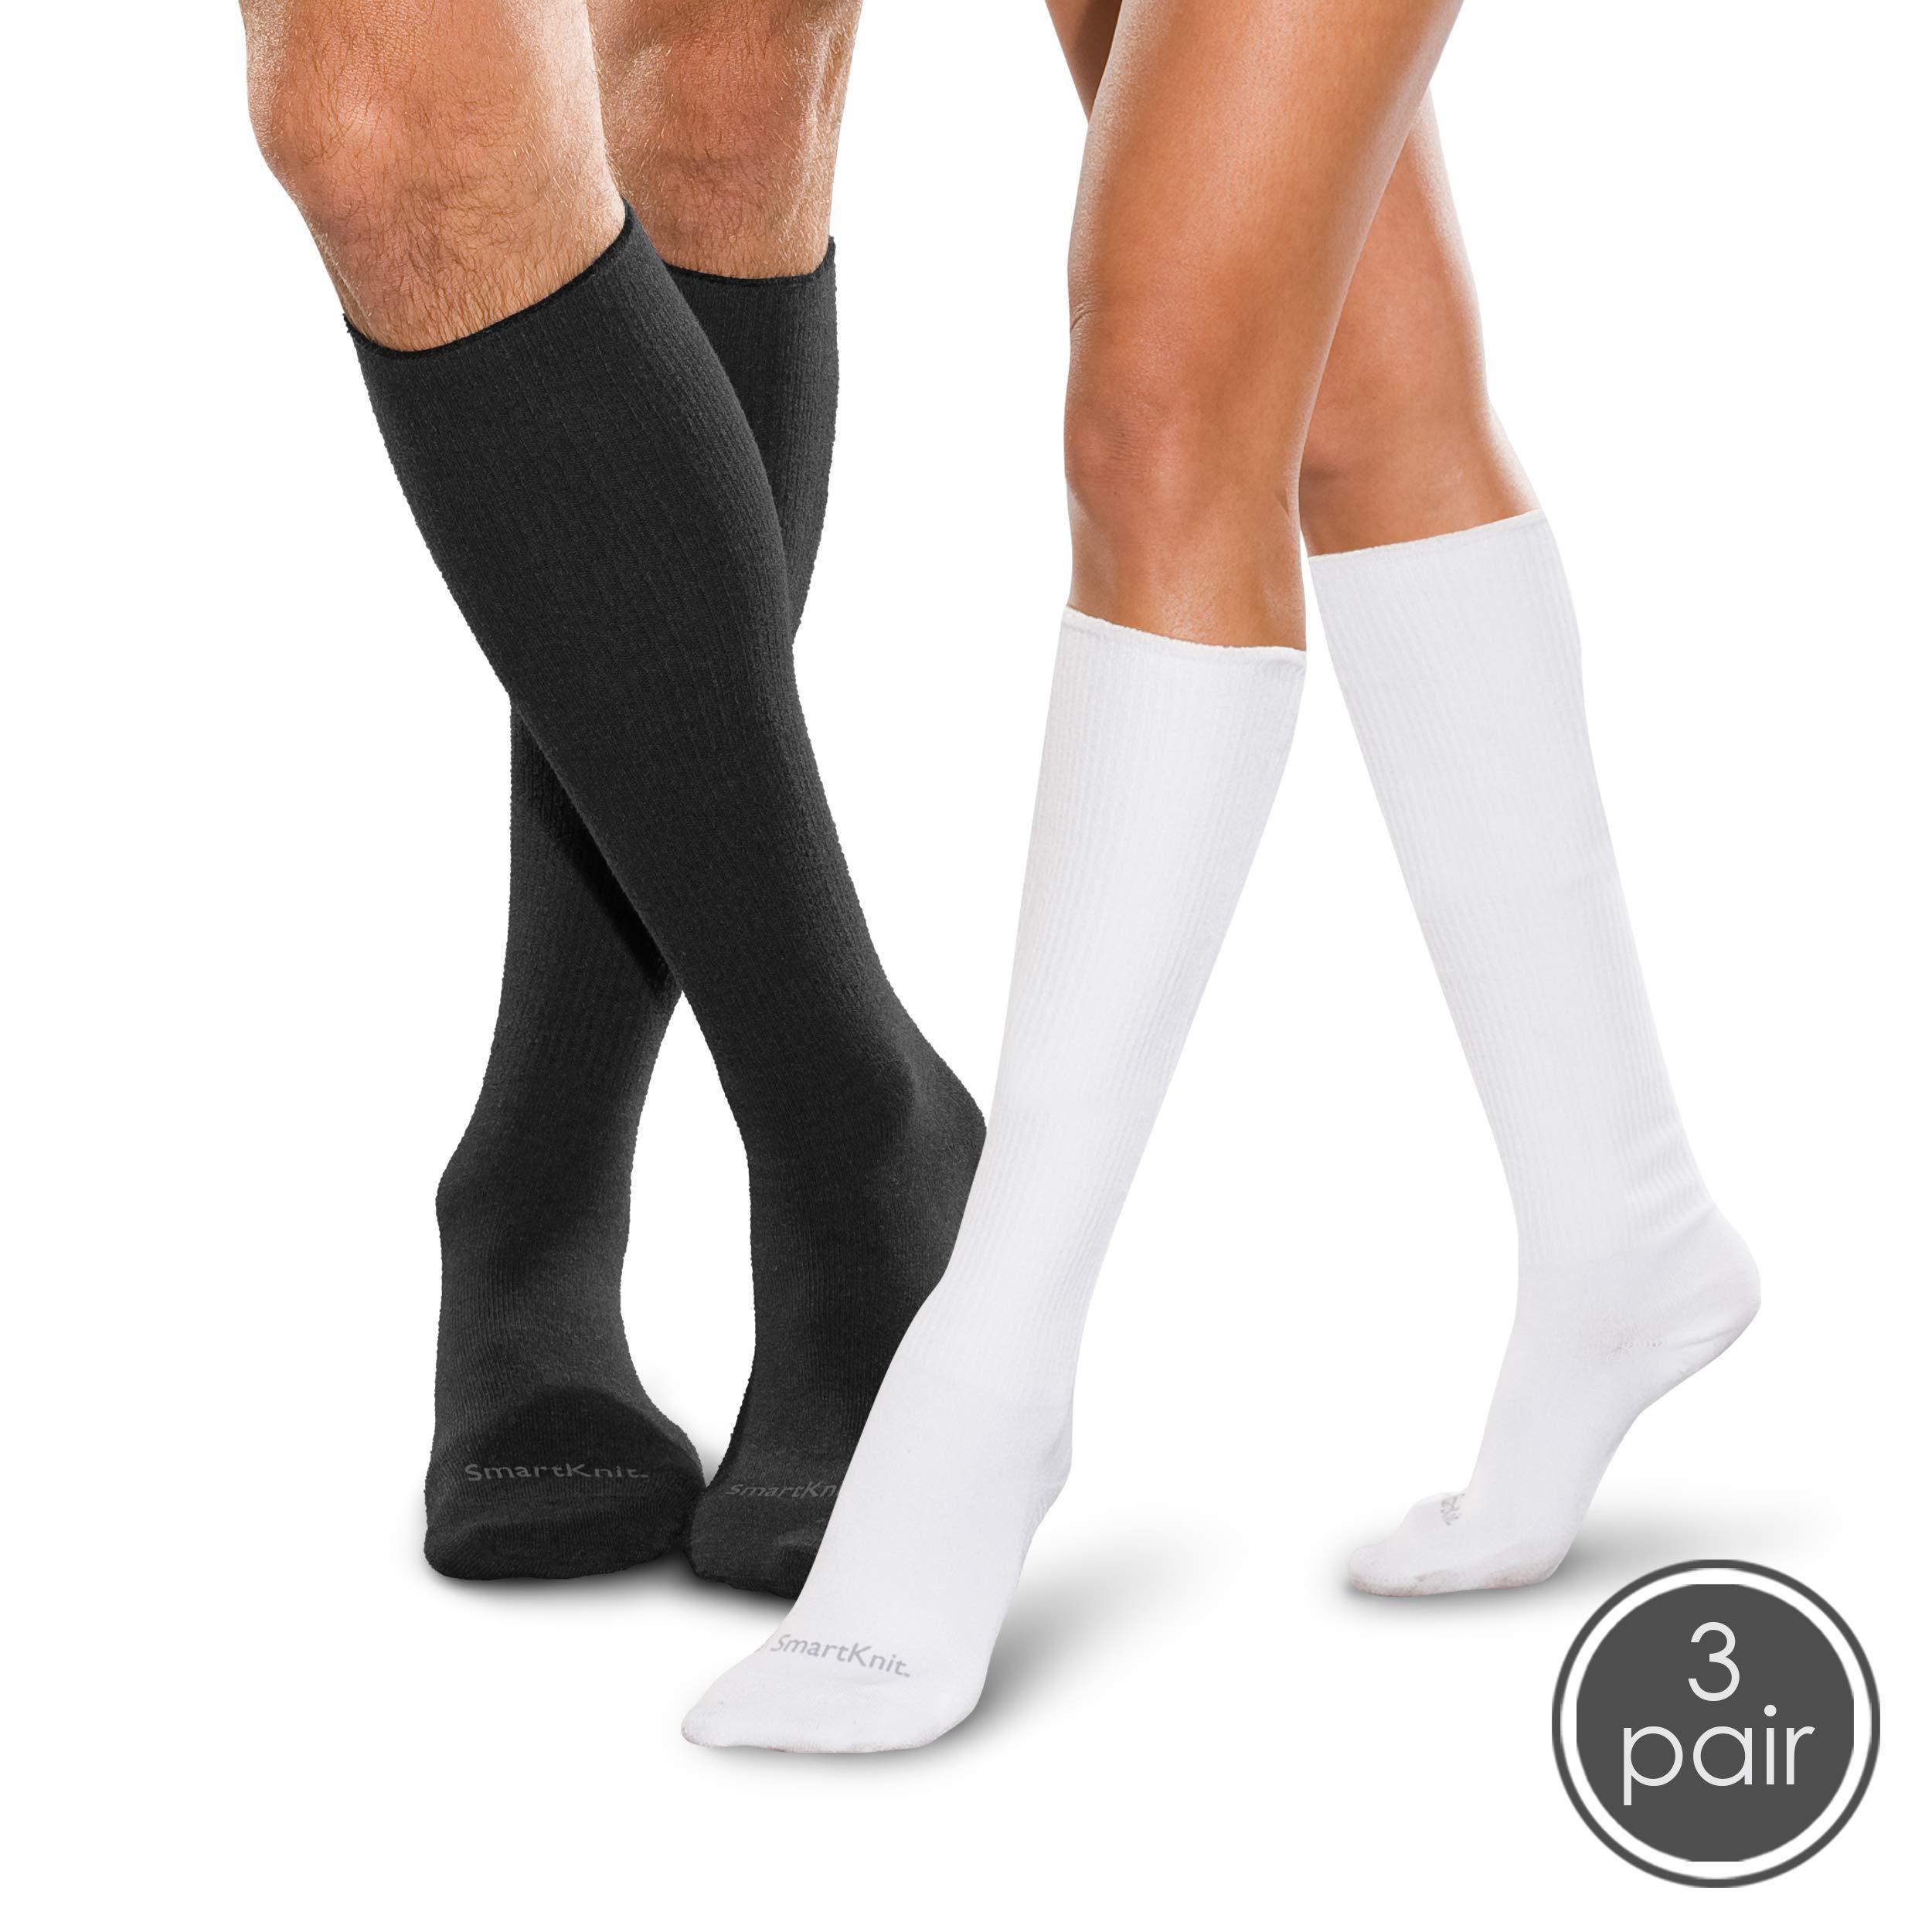 SmartKnit Seamless Diabetic Over-The-Calf Socks- 3 Pack - Large - Black White & White